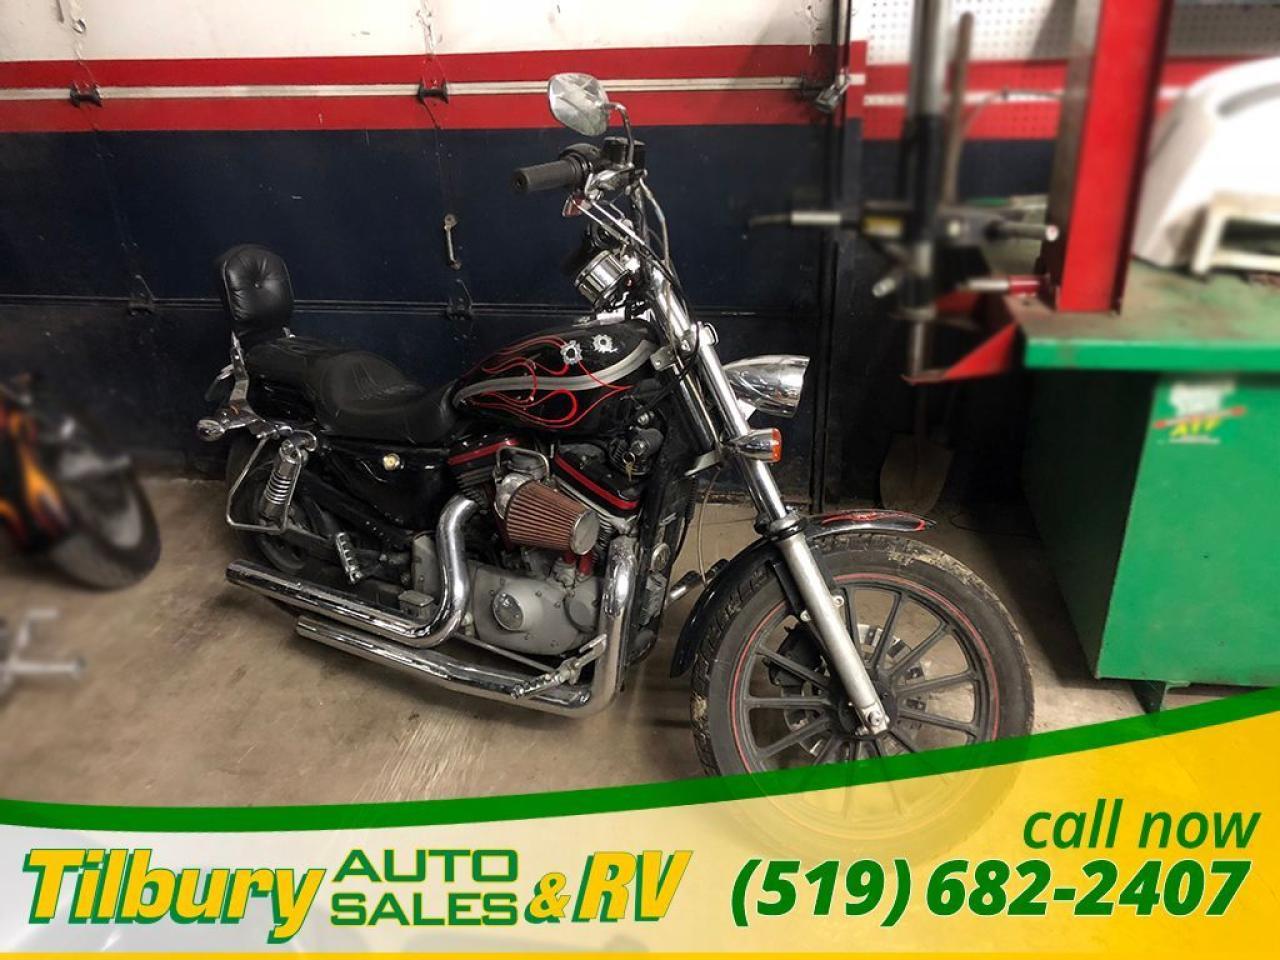 2003 Harley-Davidson XL883C 883cc Evolution® engine